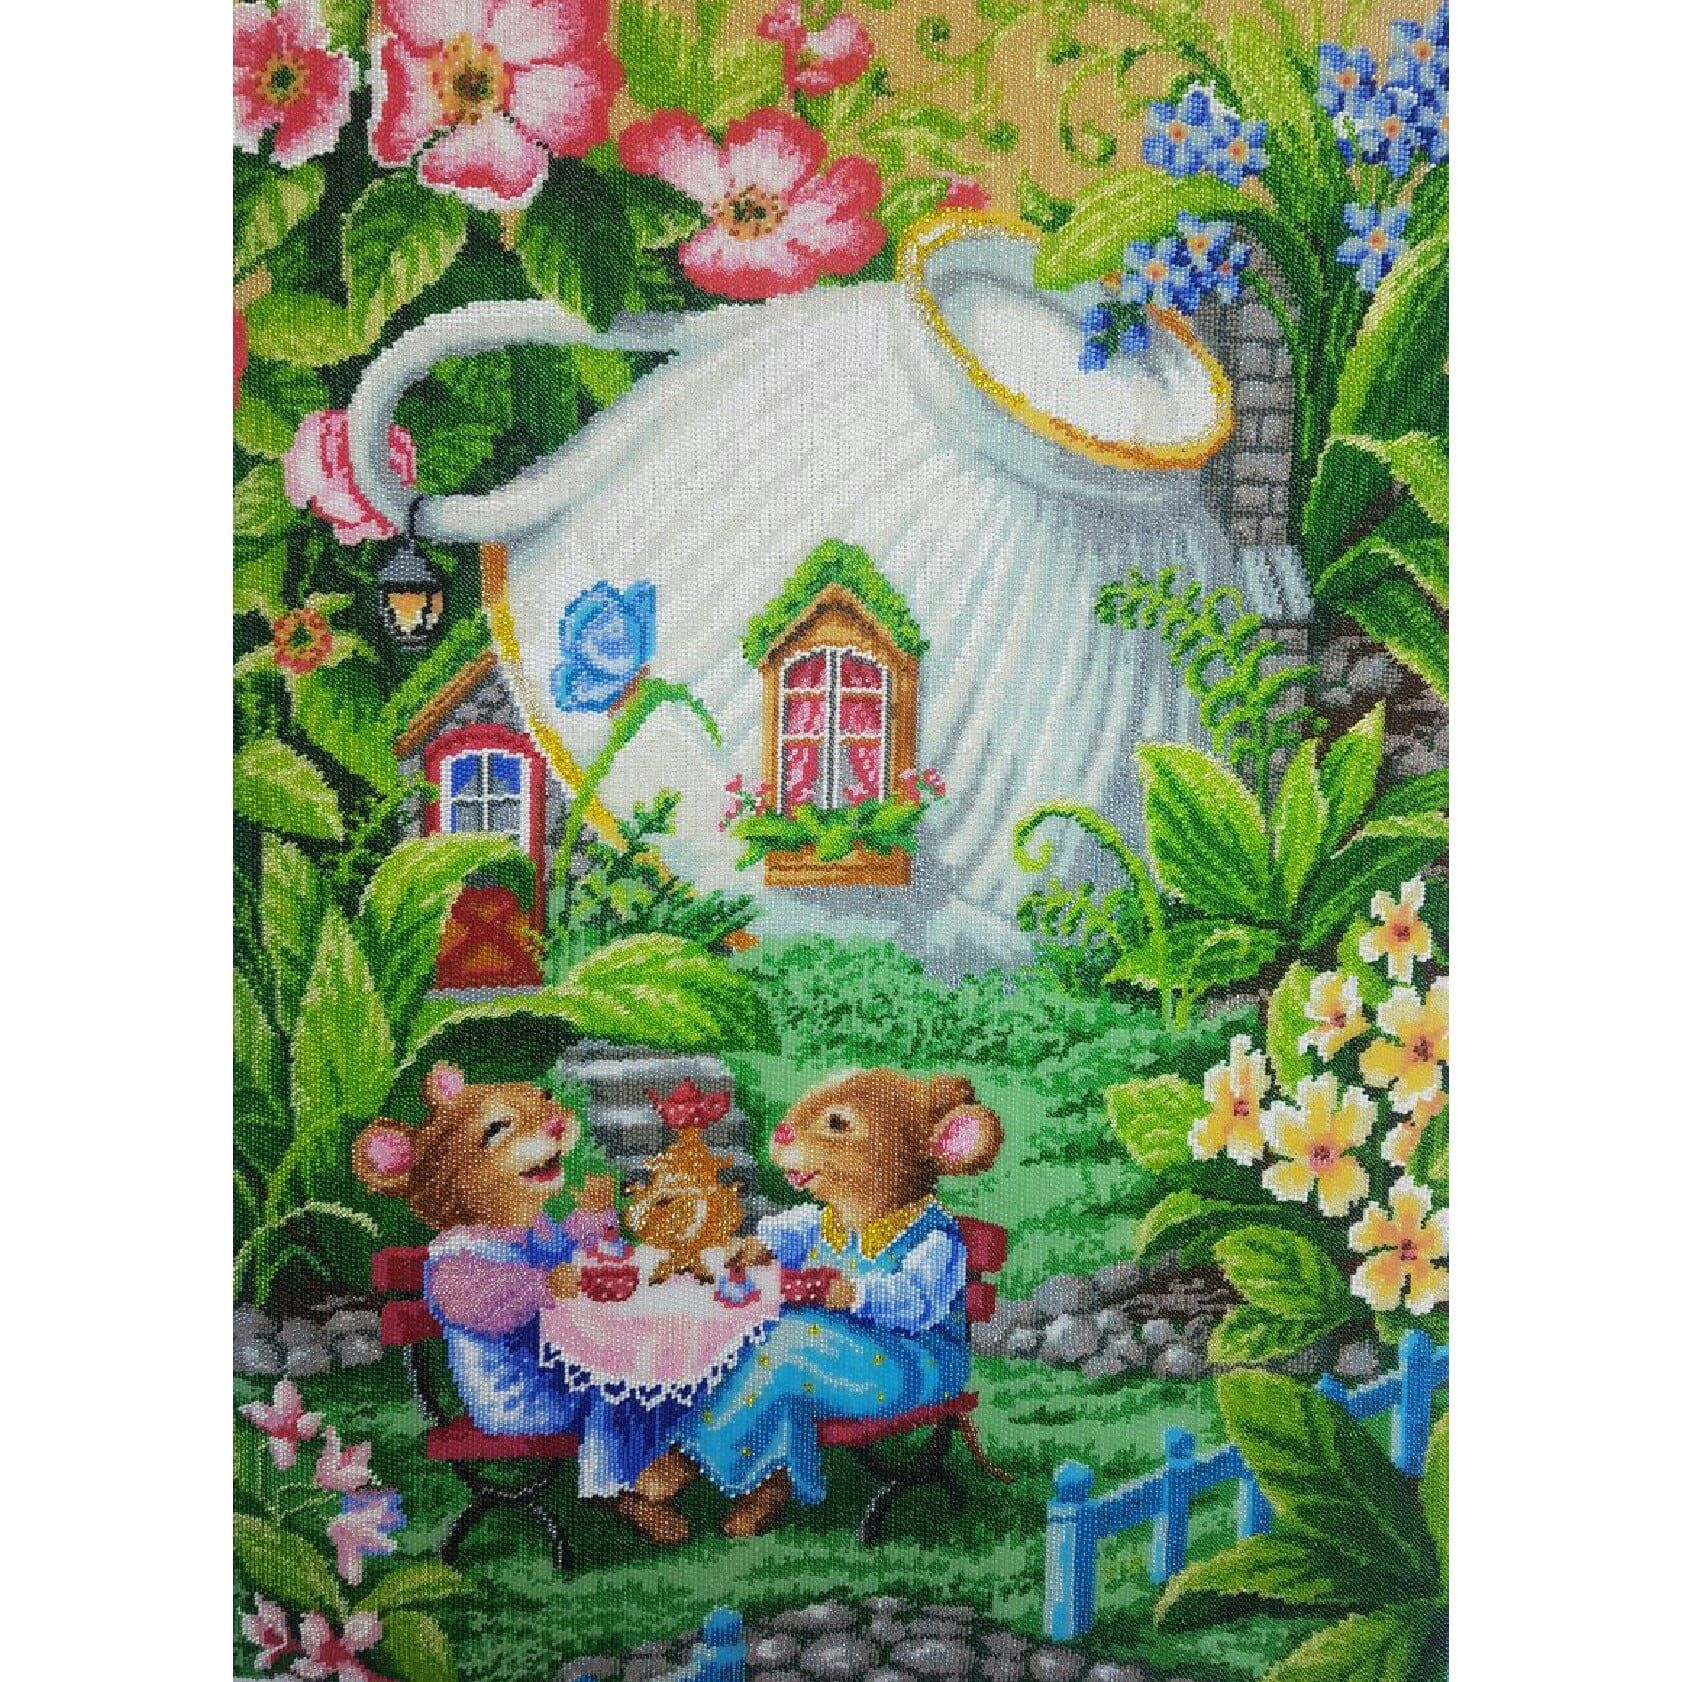 искусство for mouse handmade picture embroidery beadwork kitchen хохотушки бисером вышитая работа art картина бисера готовая мышки